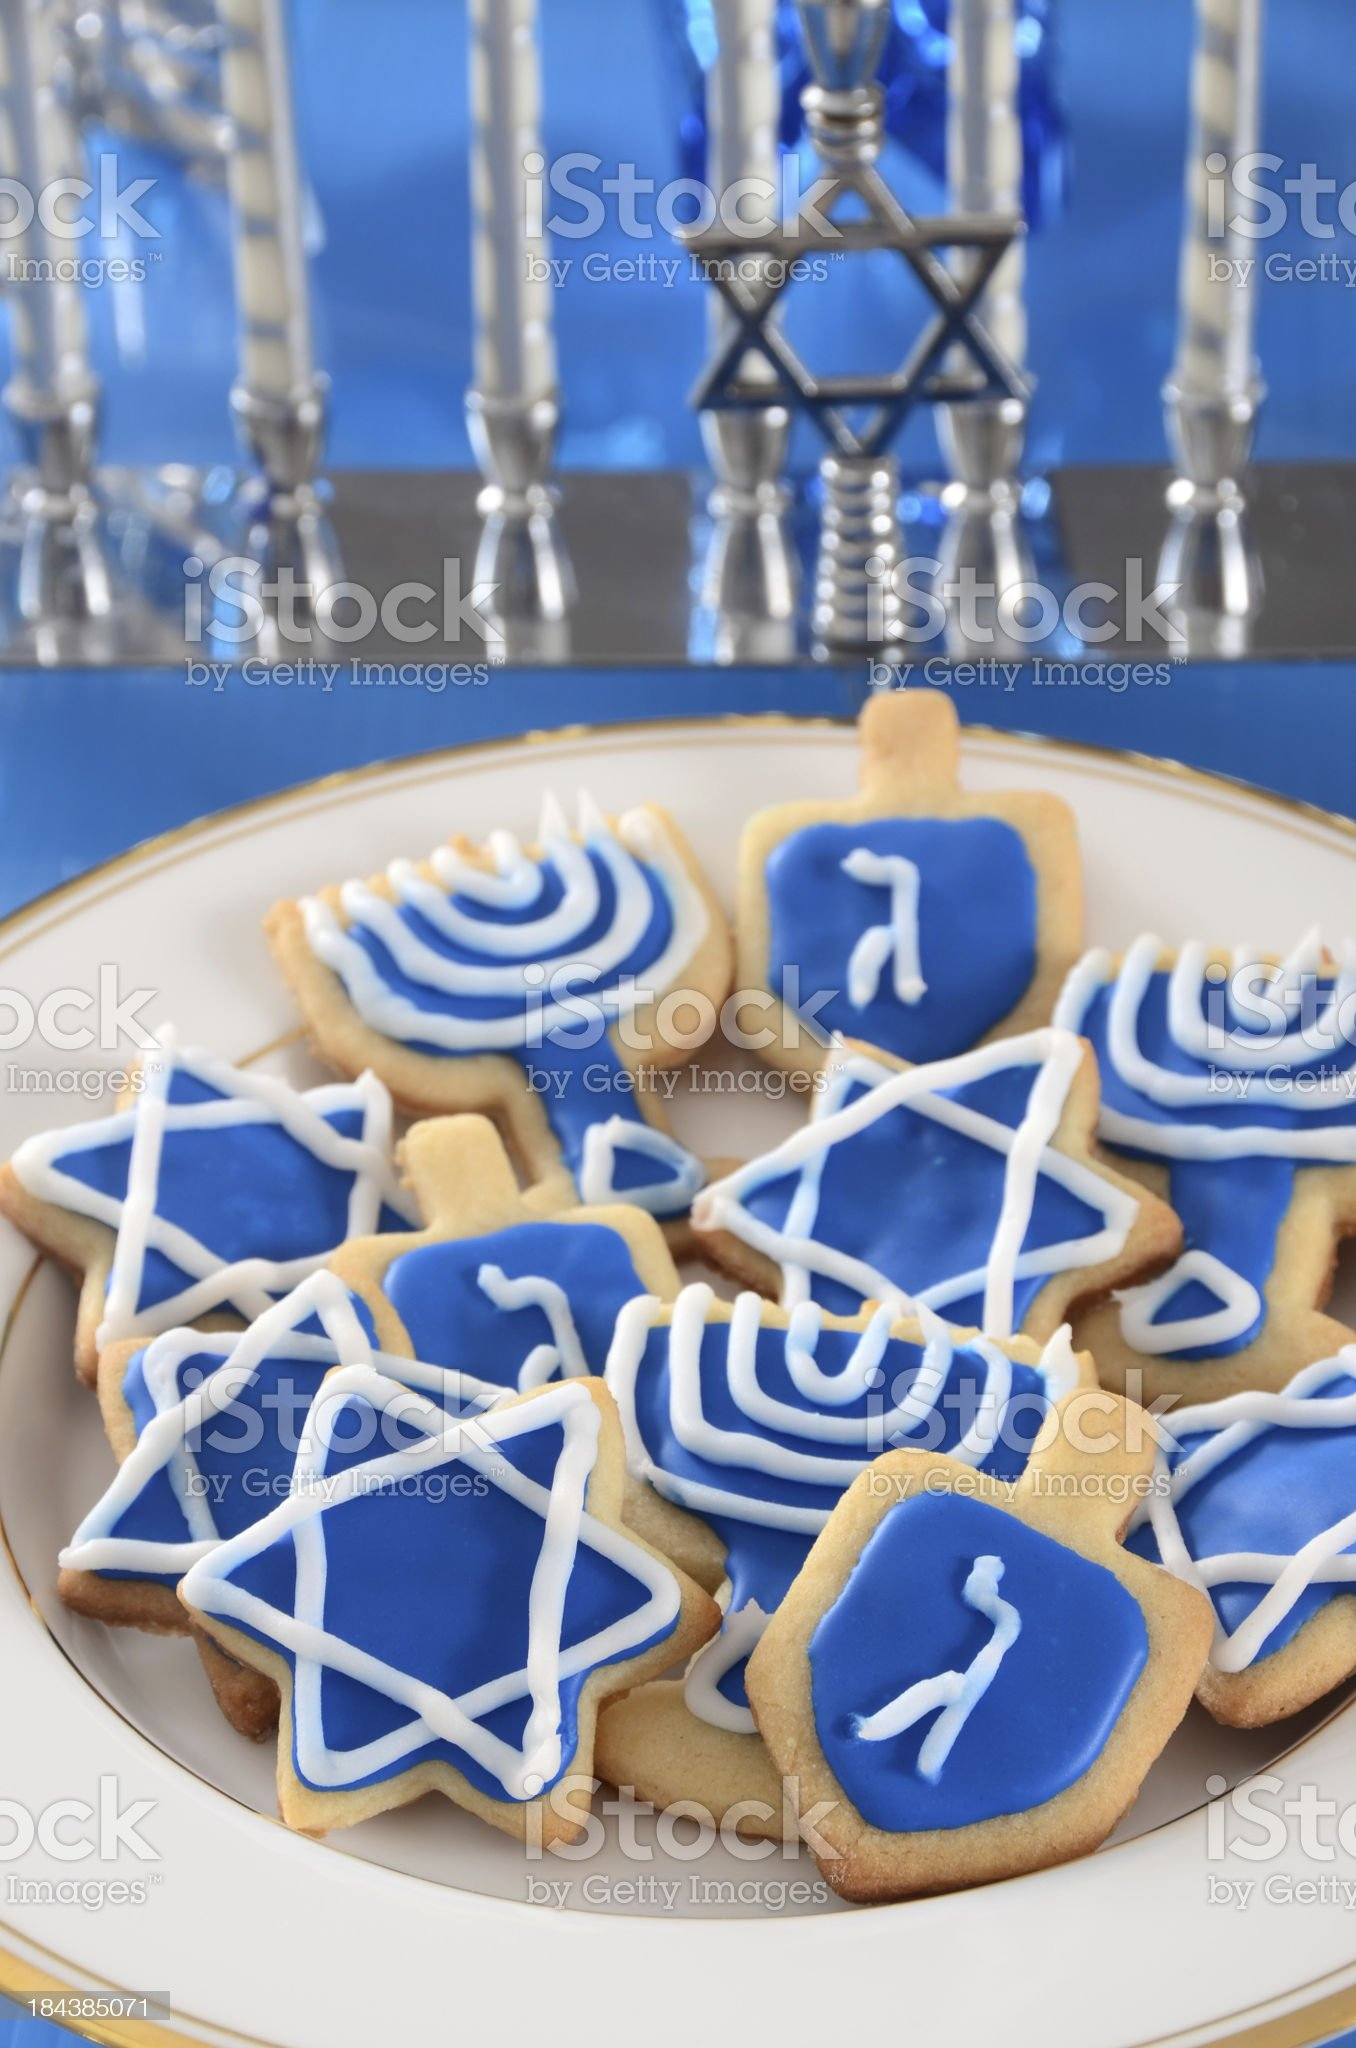 Hanukkah Cookies royalty-free stock photo